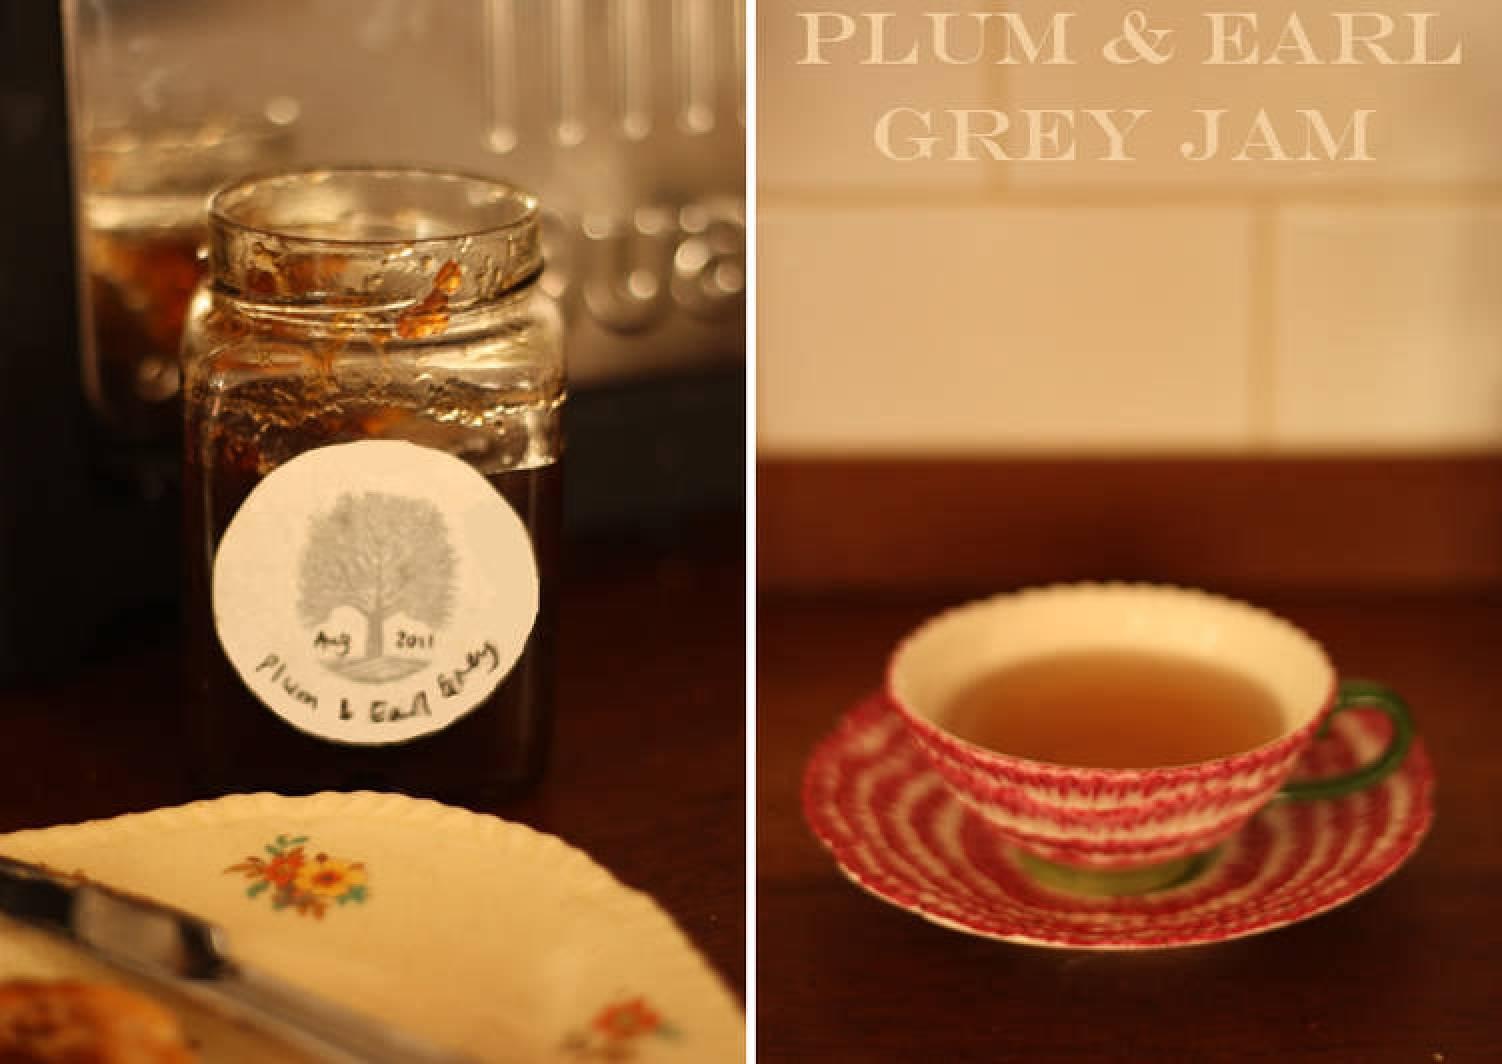 Plum and Earl Grey jam